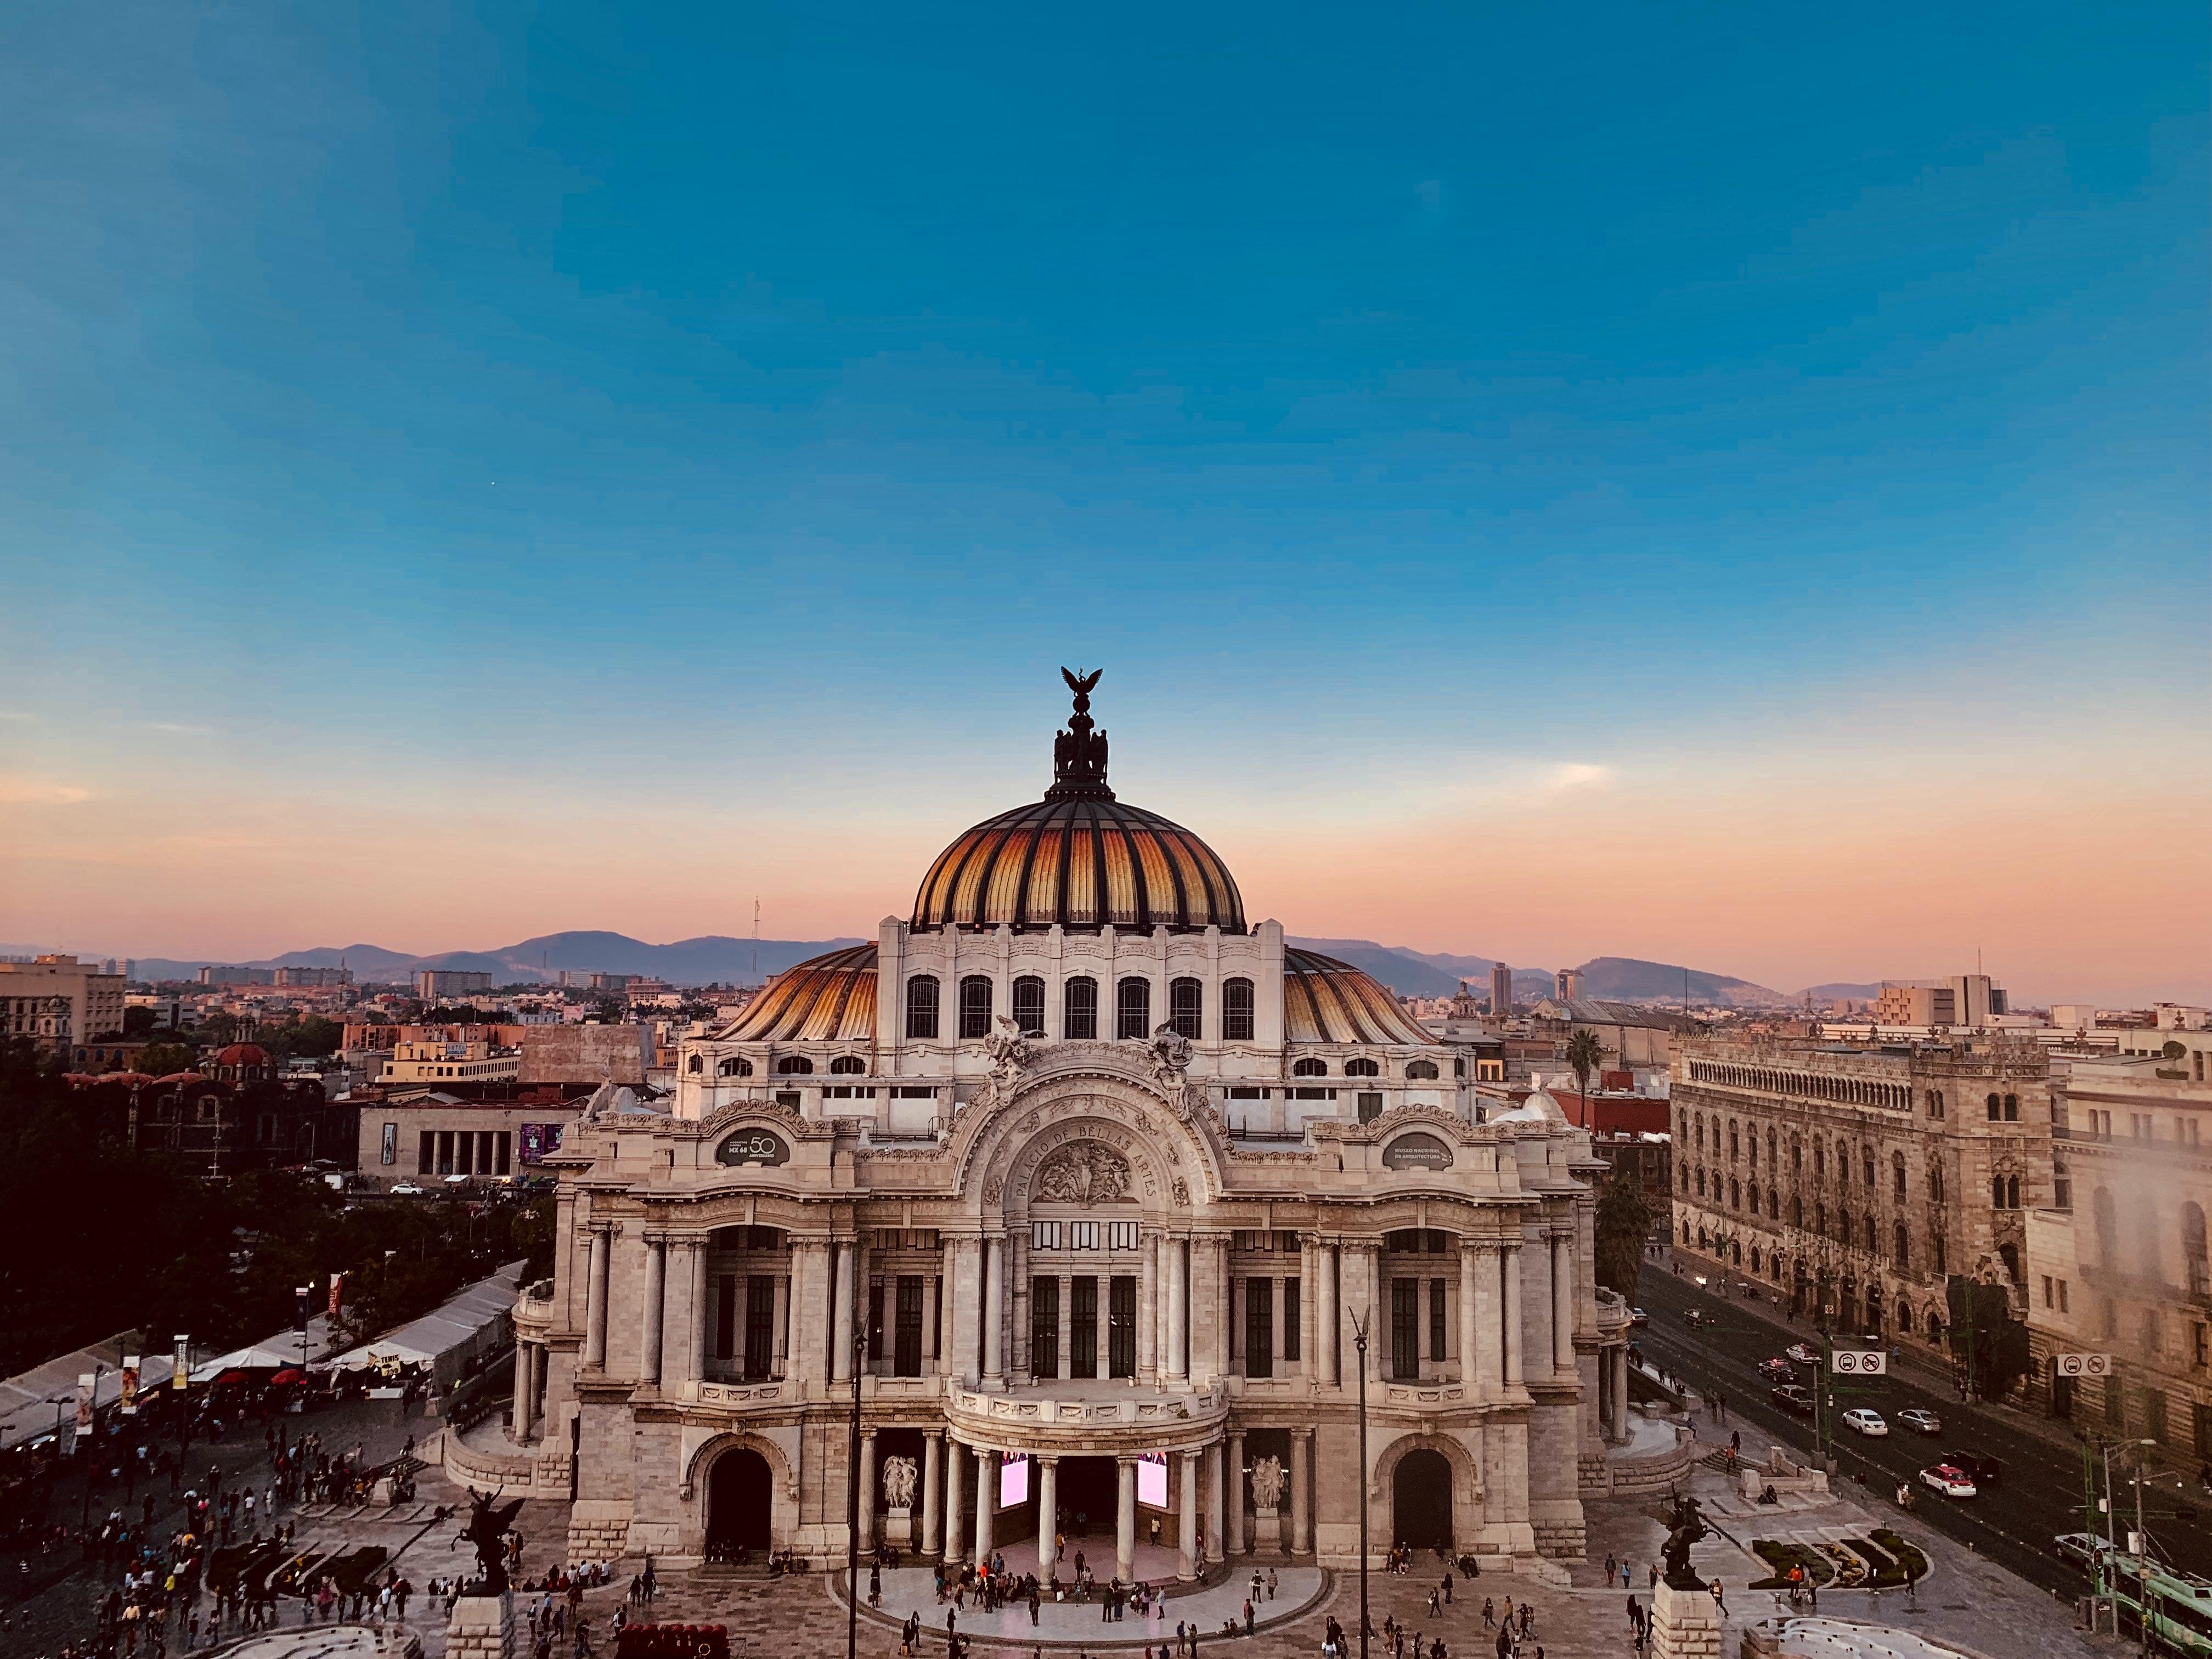 Mexico City Photo by Carlos Aguilar